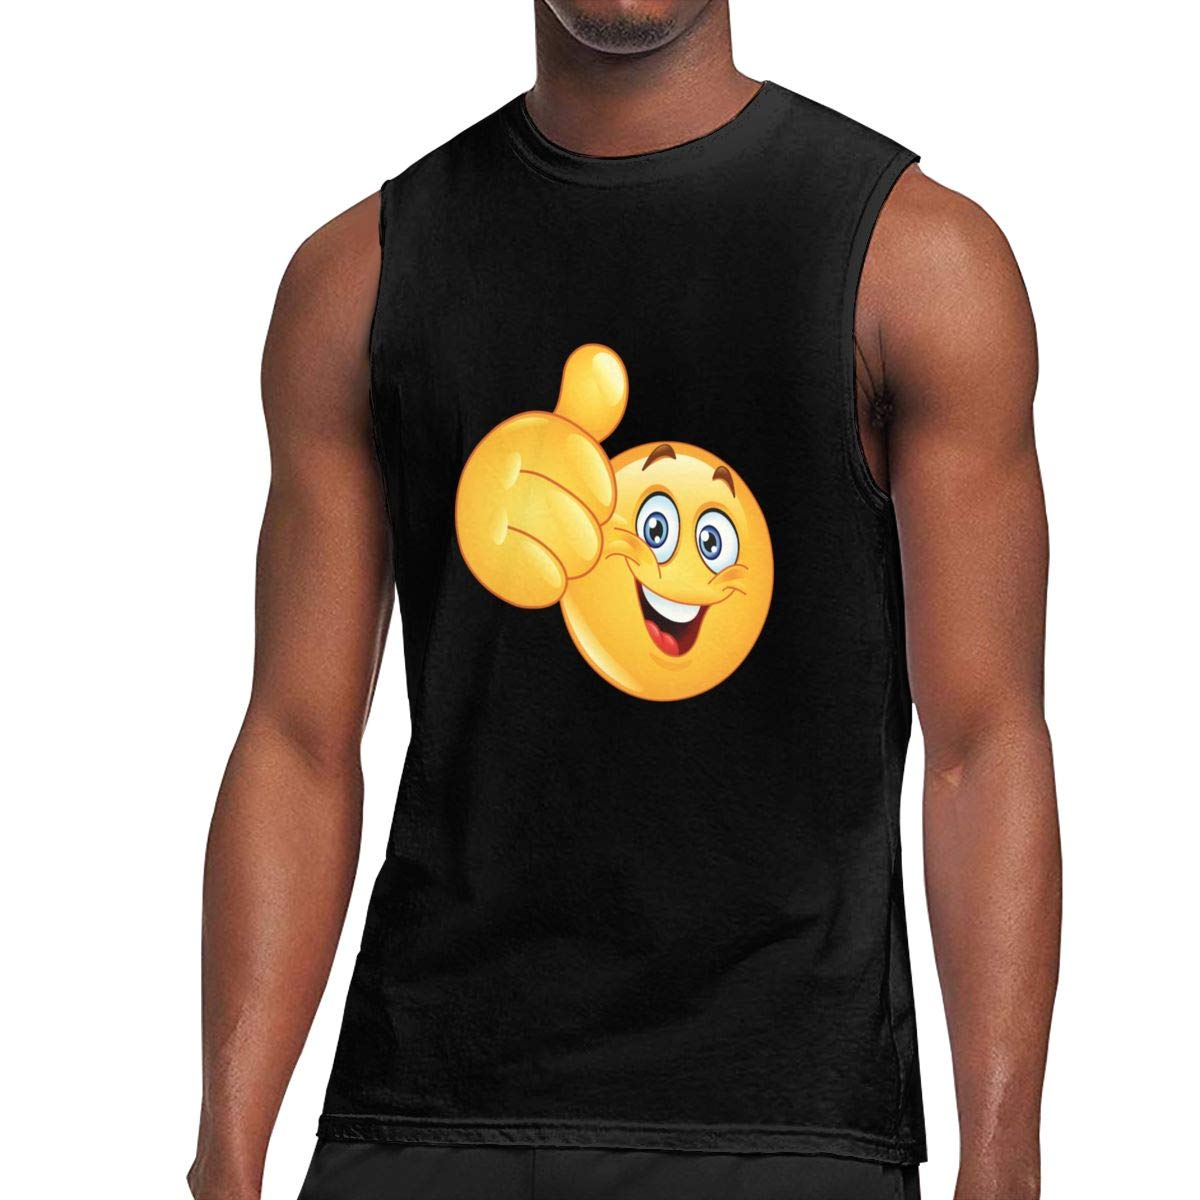 Seuriamin Smiley Face Thumb Up Tennis Sleeveless Muscle Short Sleeve Shirt